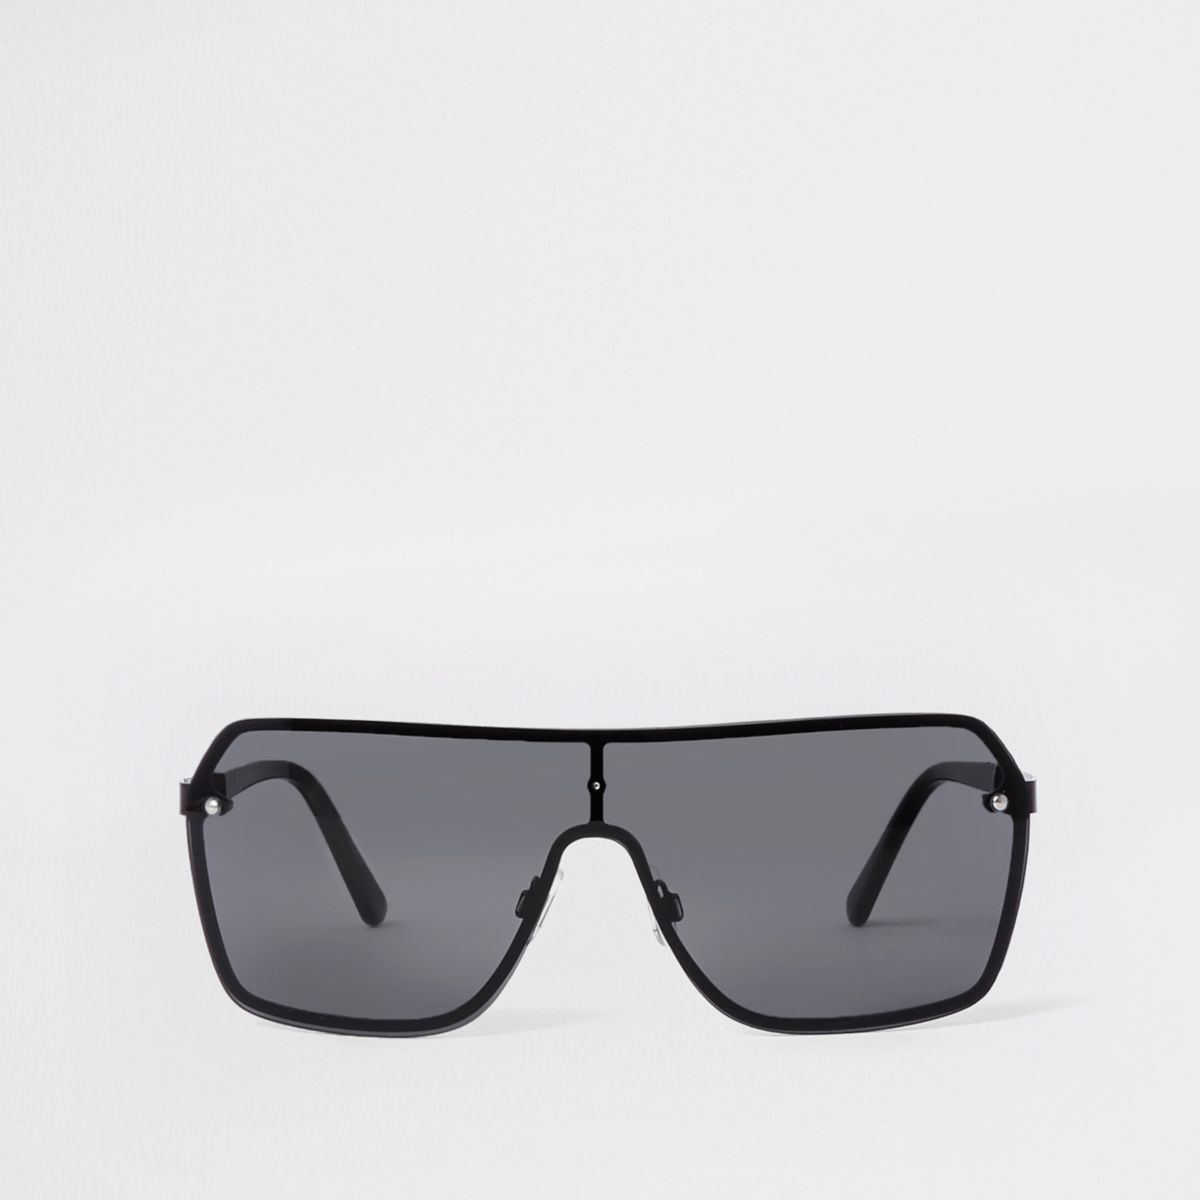 Black visor aviator sunglasses